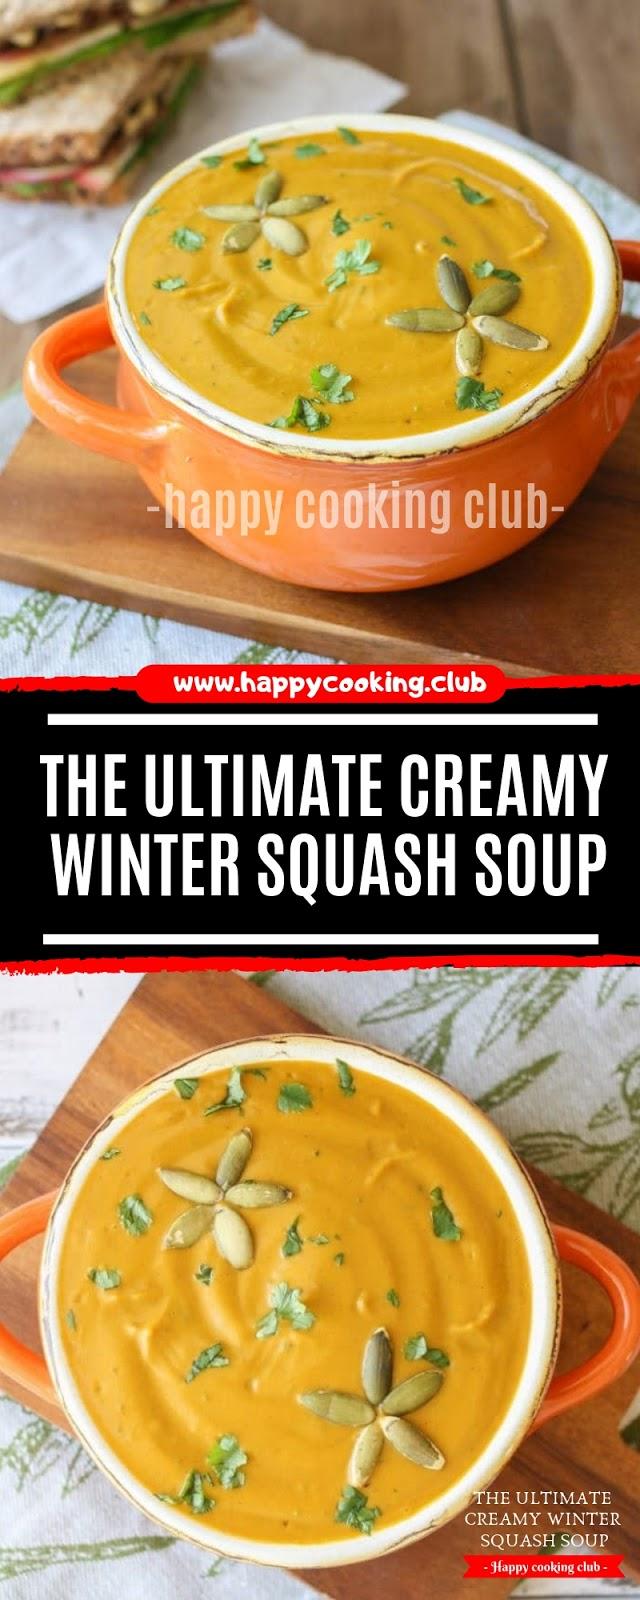 THE ULTIMATE CREAMY WINTER SQUASH SOUP